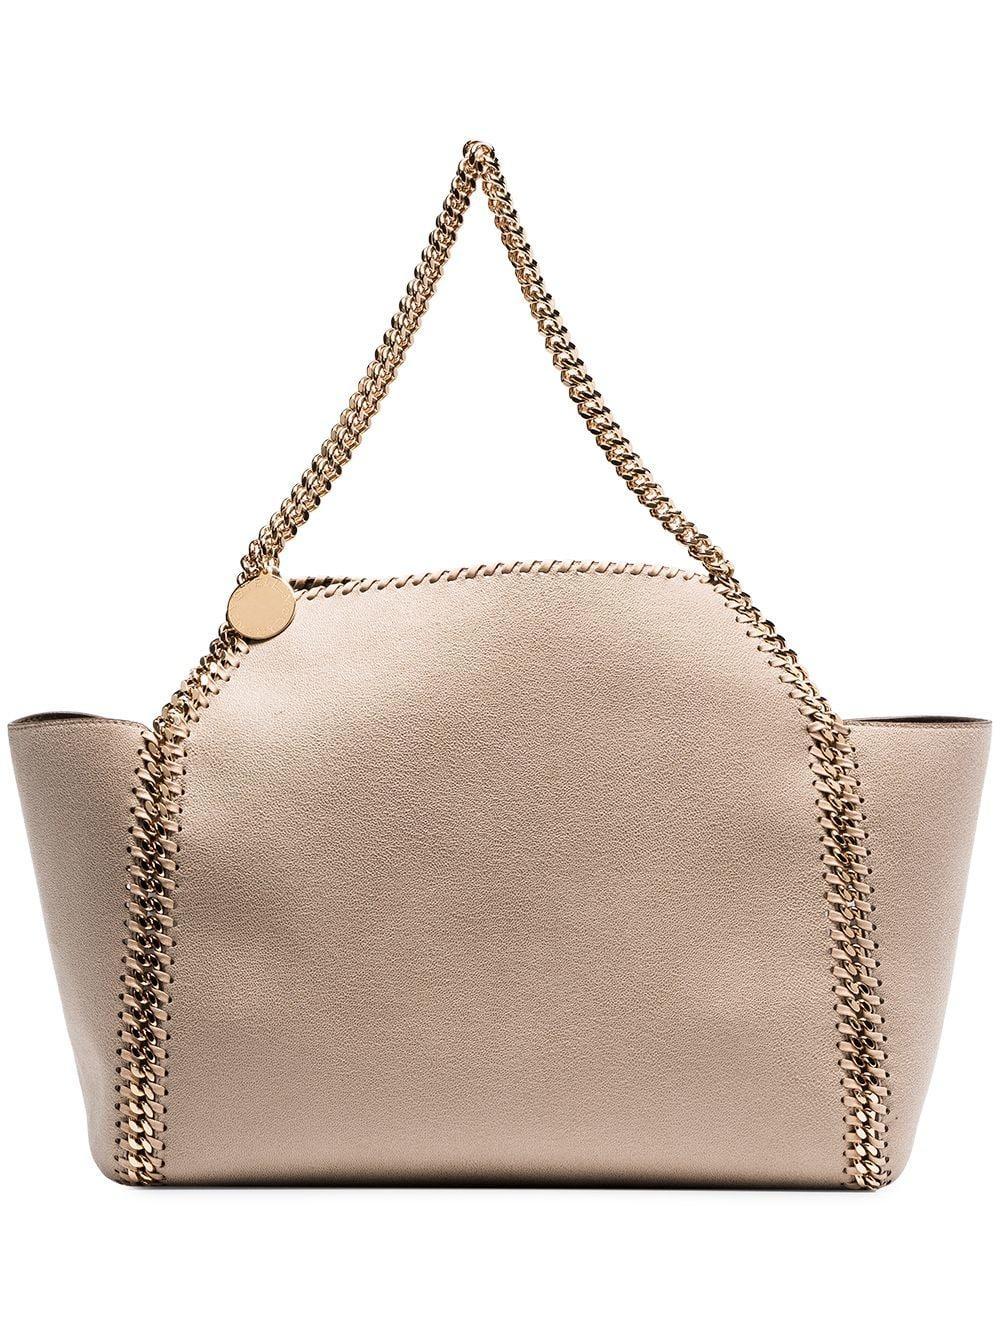 baf9da56fe50 Lyst - Stella McCartney Tote Bag in Natural - Save 2.163225172074732%